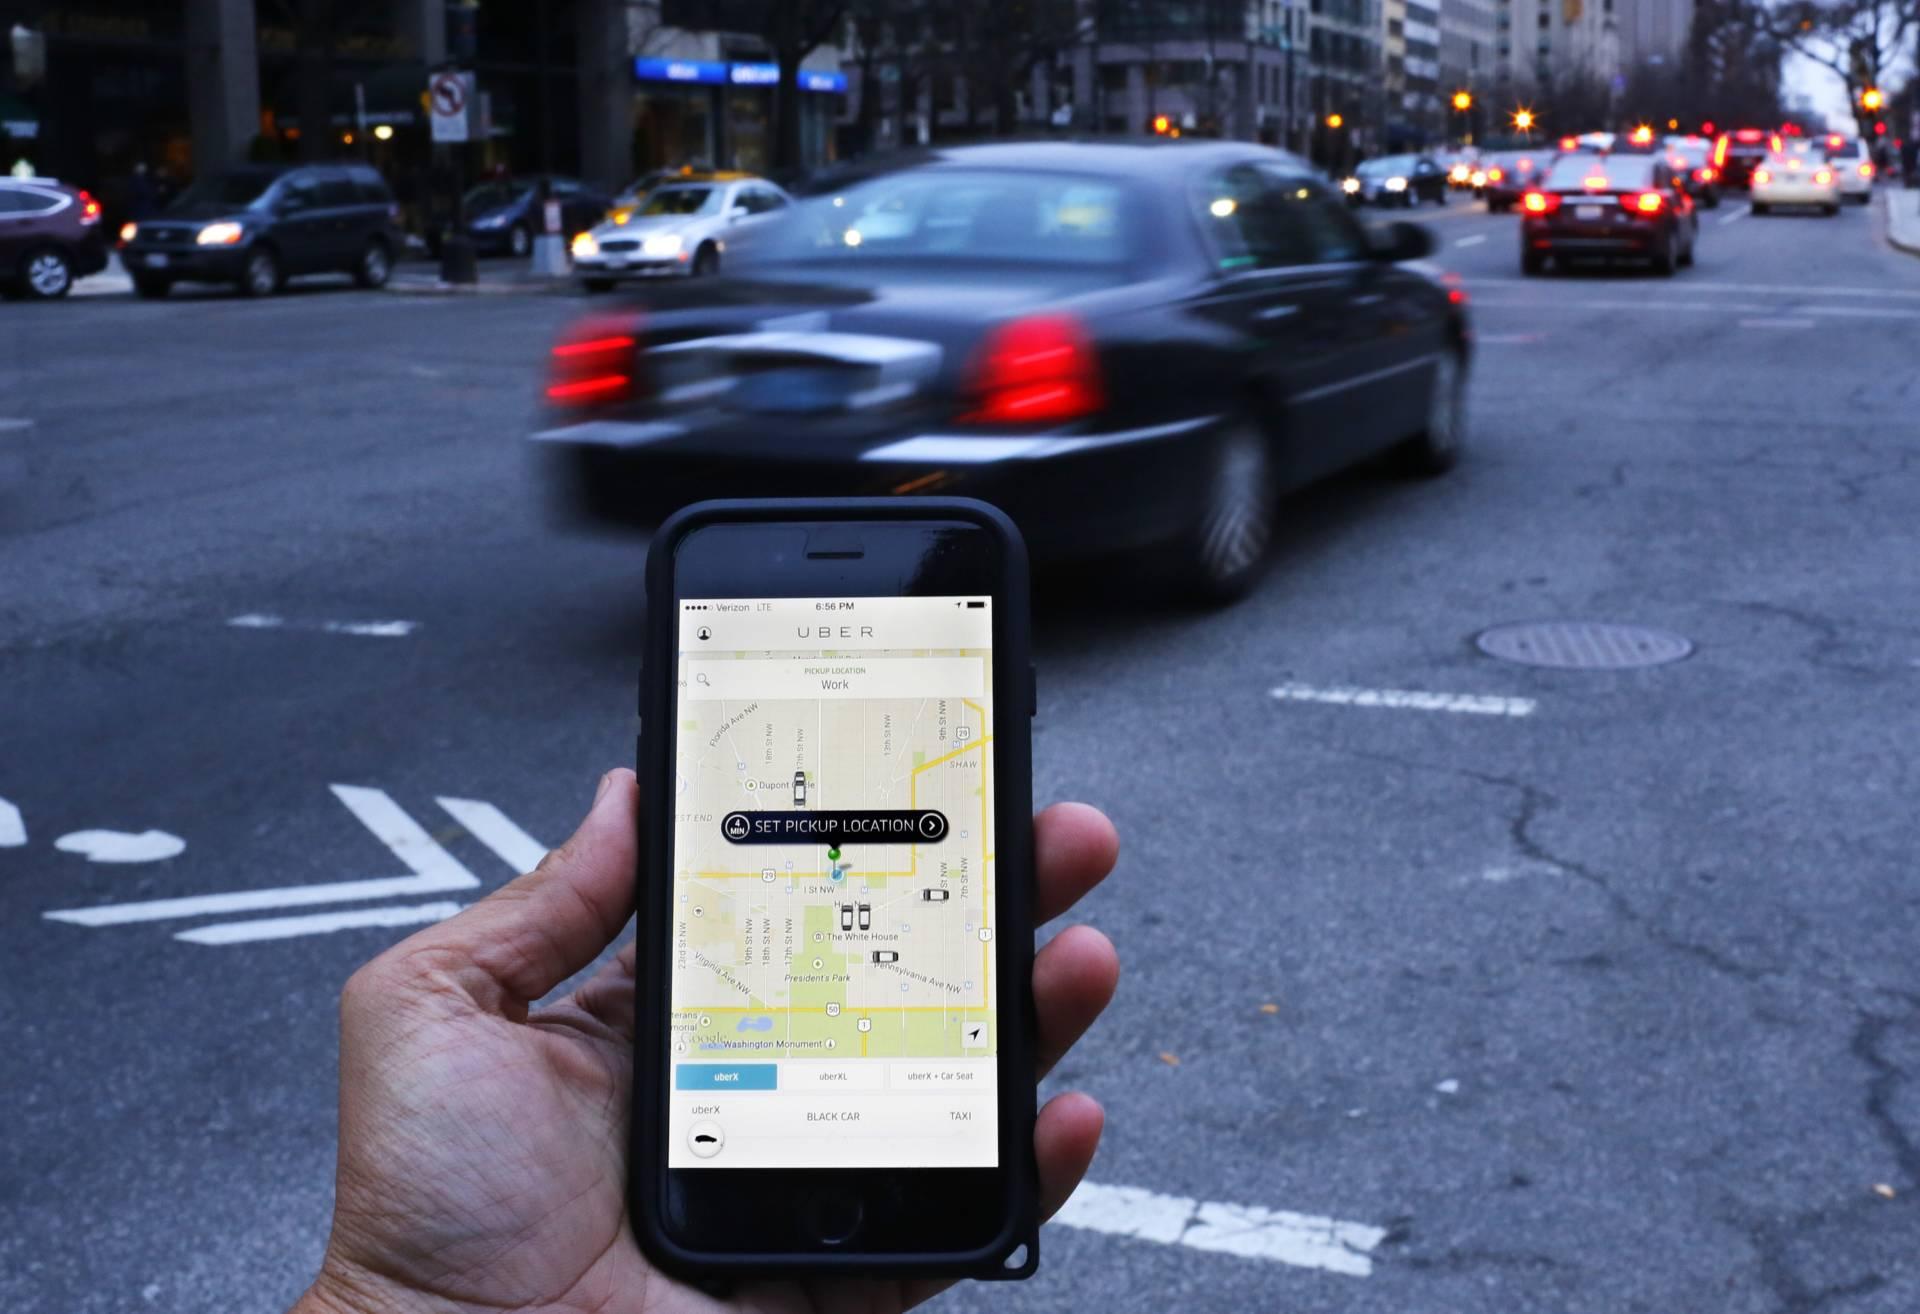 Pilot Program to Help Dublin Commuters Pay for Uber, Lyft, Cabs